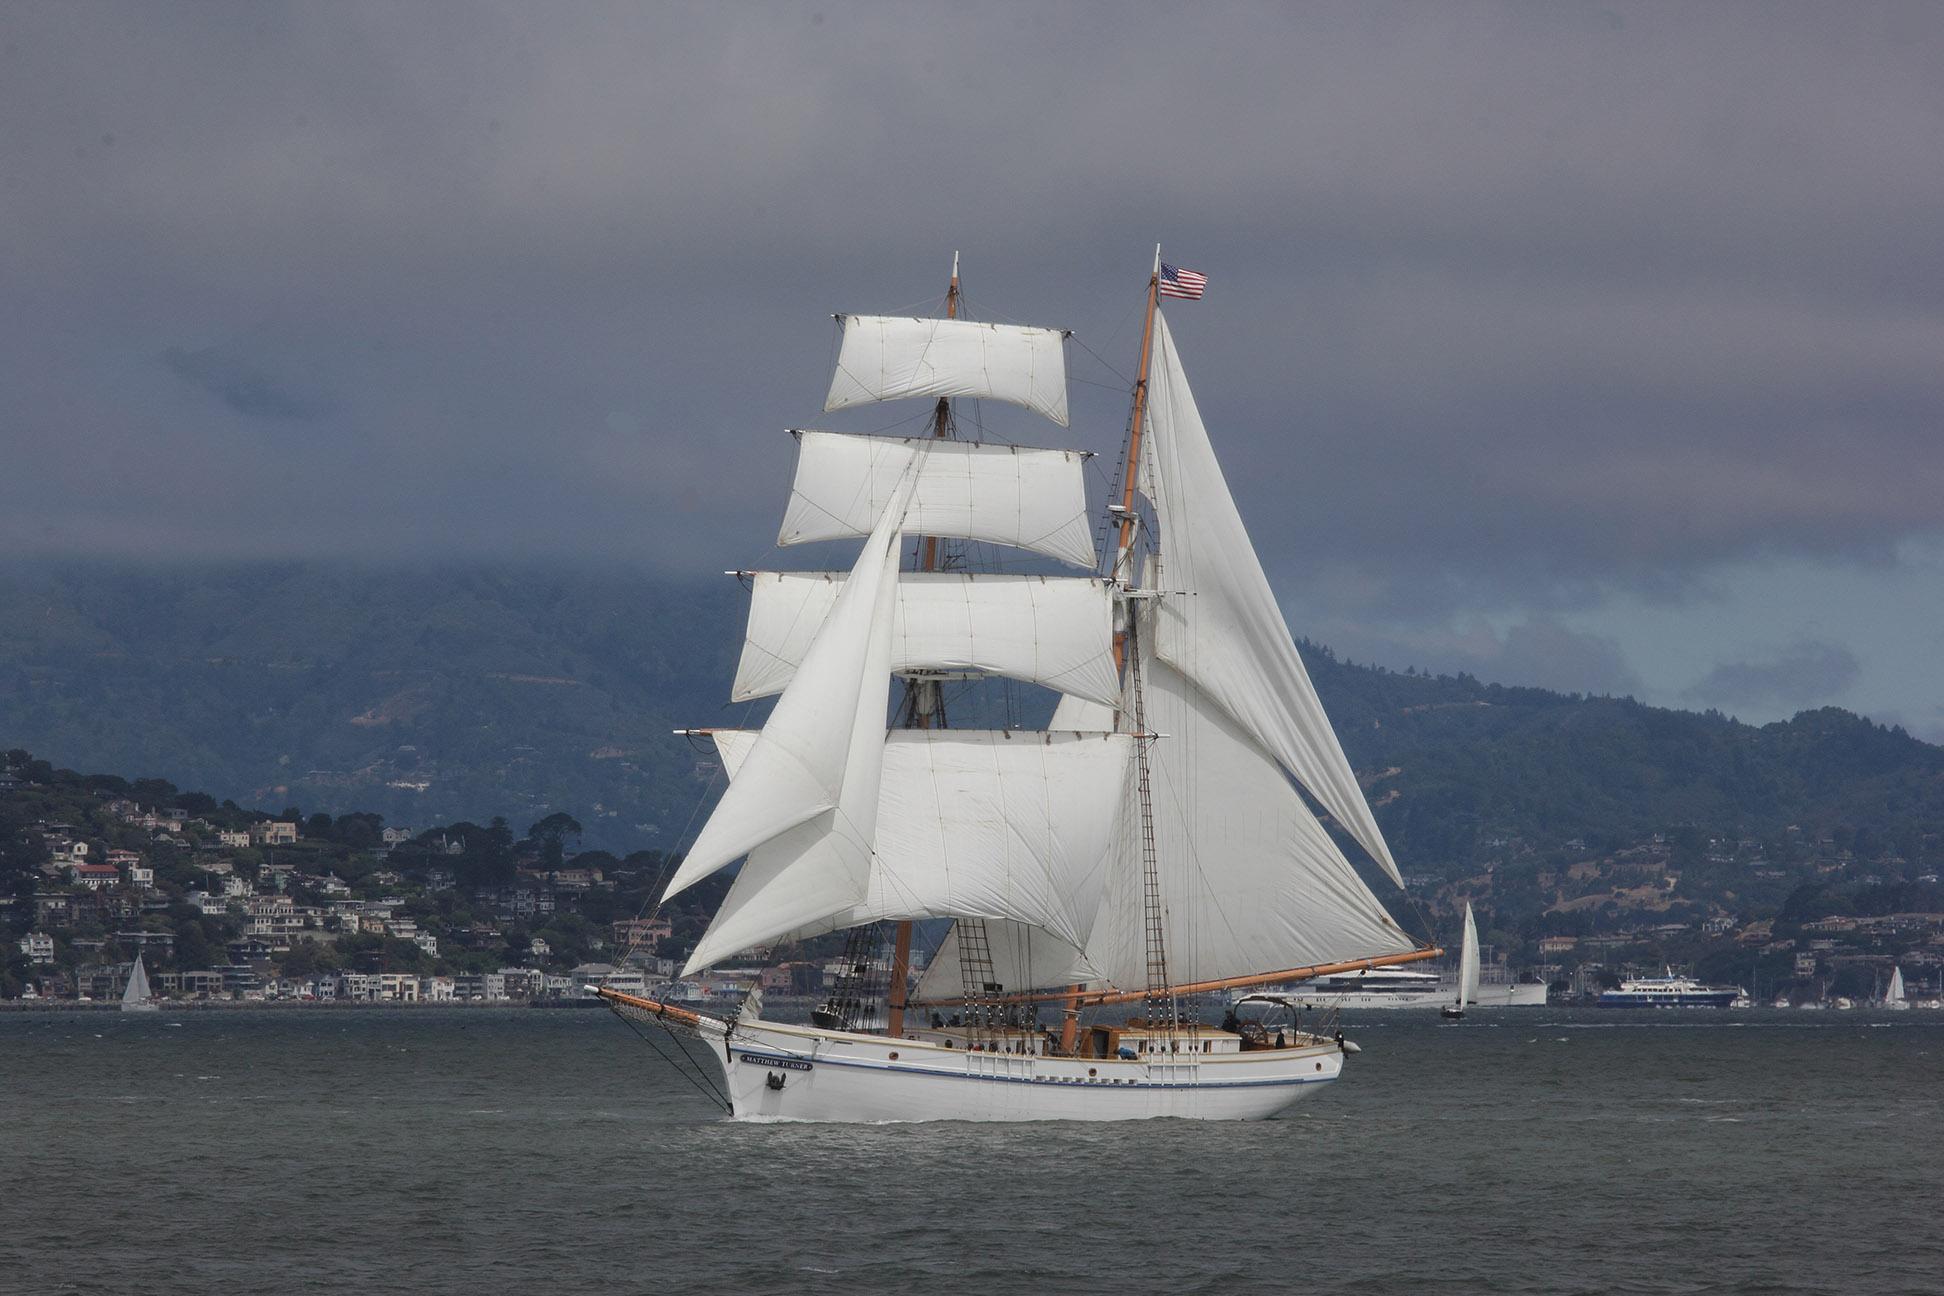 Mathew Turner will join Call of the Sea's fleet.